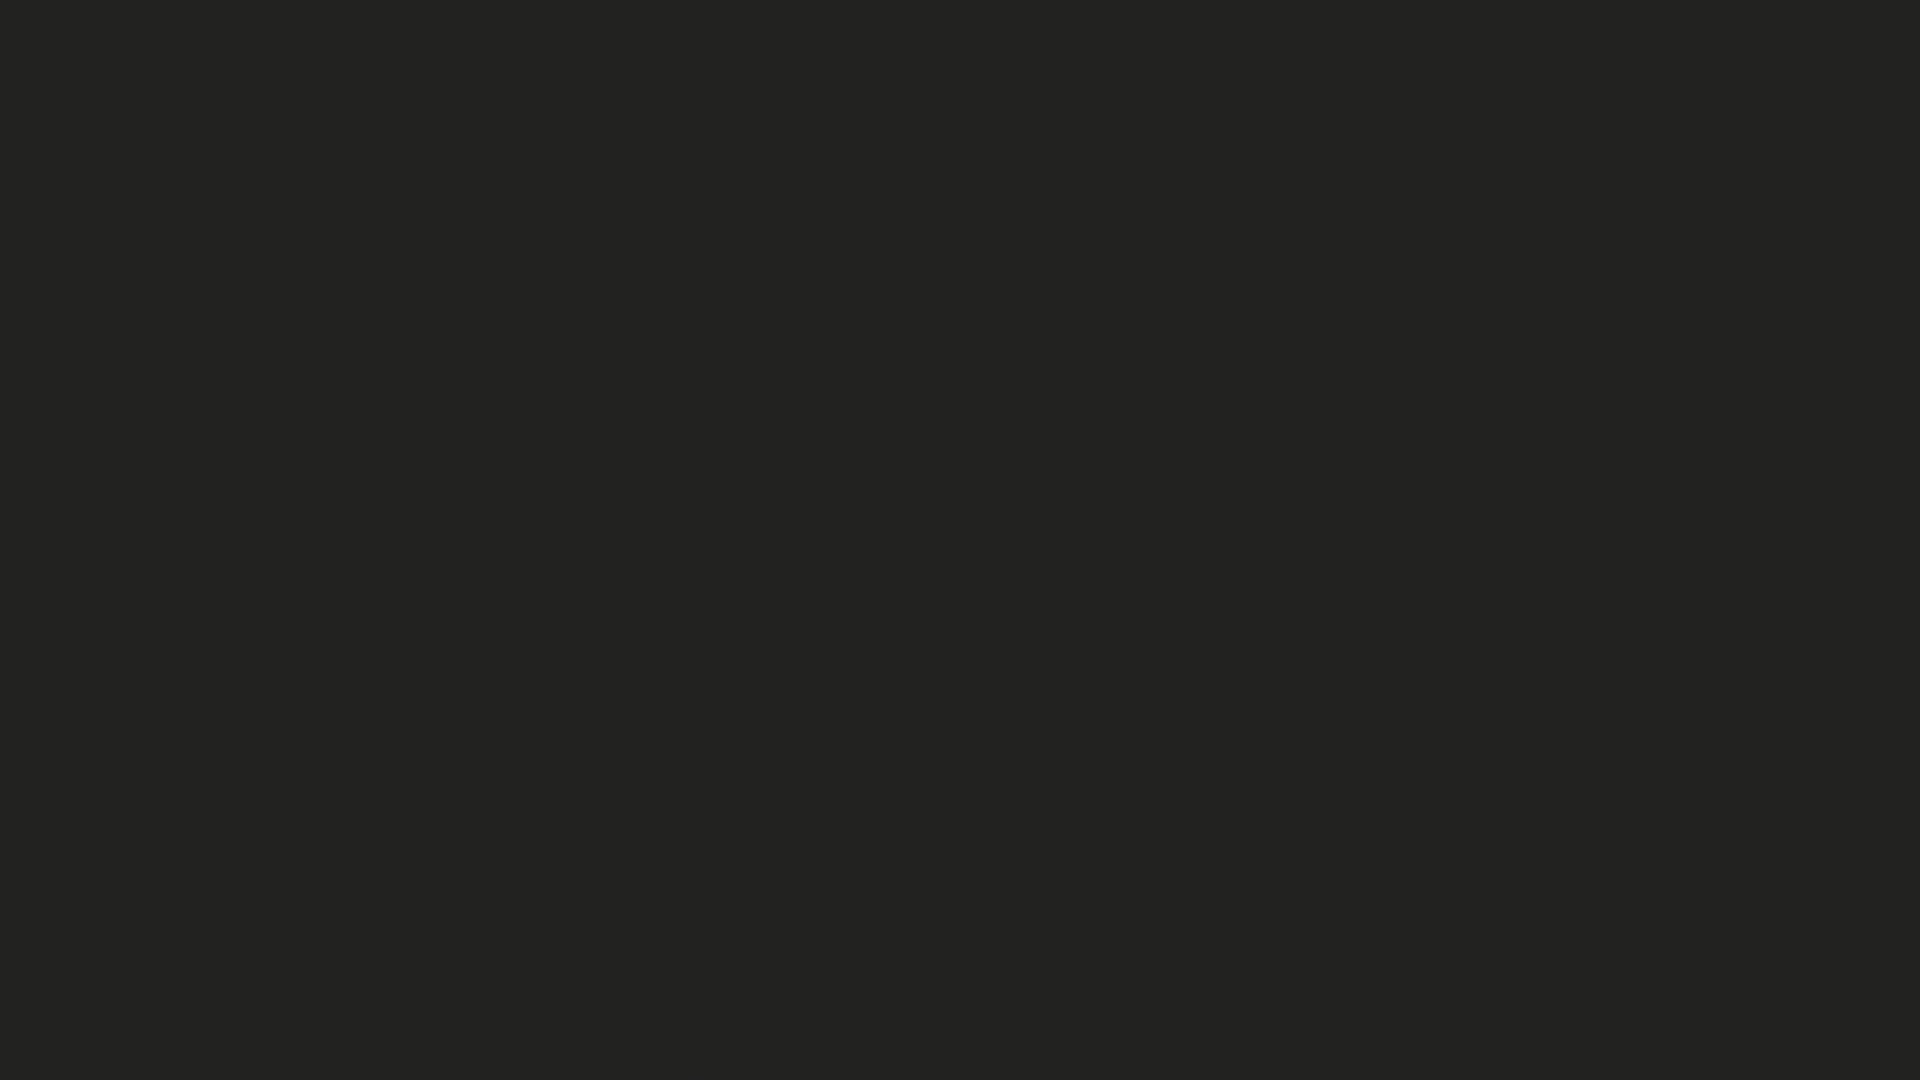 daily3d, Scorpion logo-final GIFs